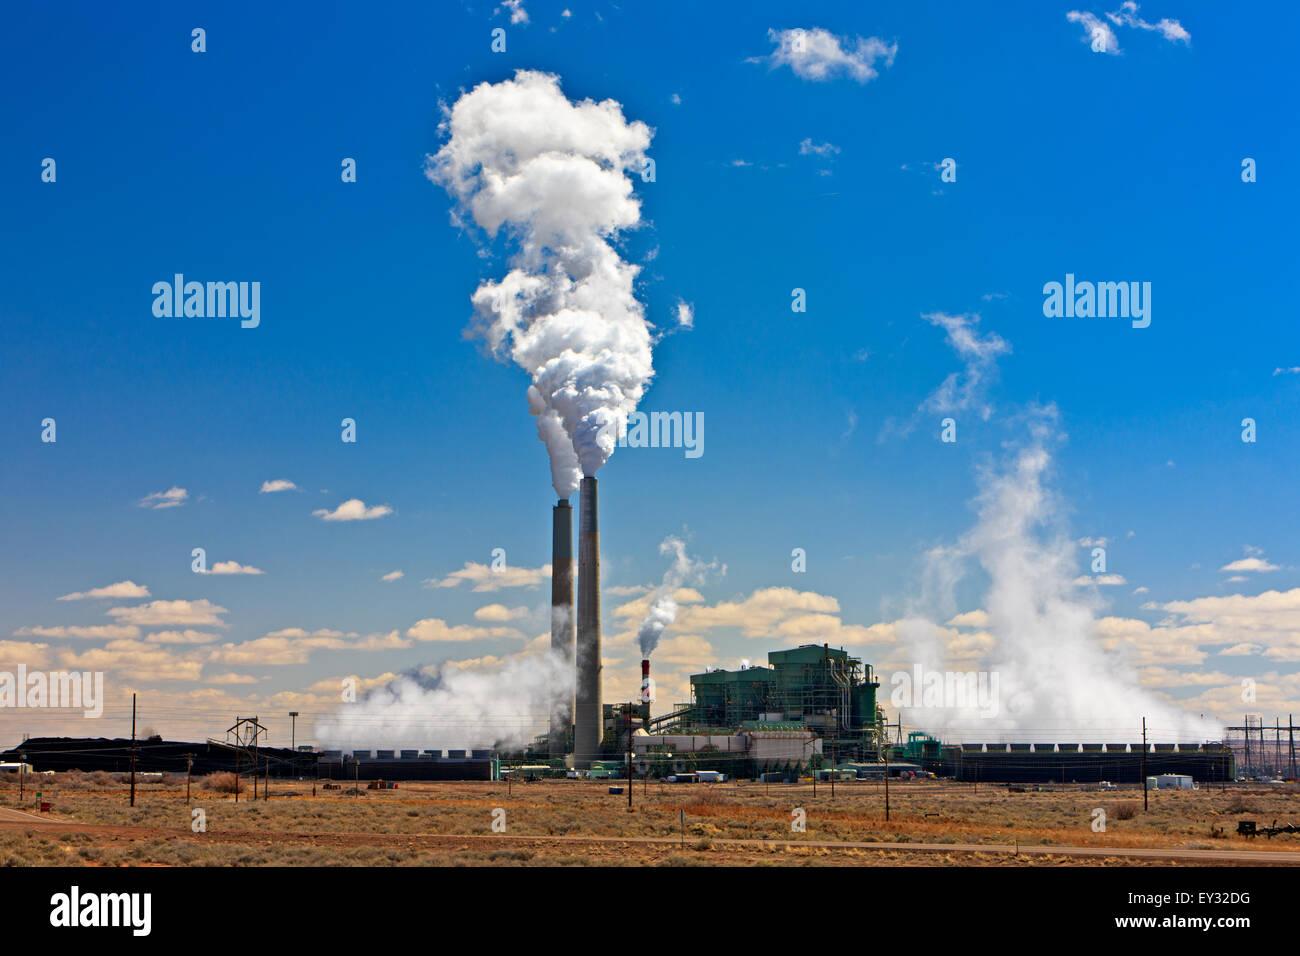 Coal-fired Cholla Power Plant with smoking smokestacks, Arizona, USA - Stock Image